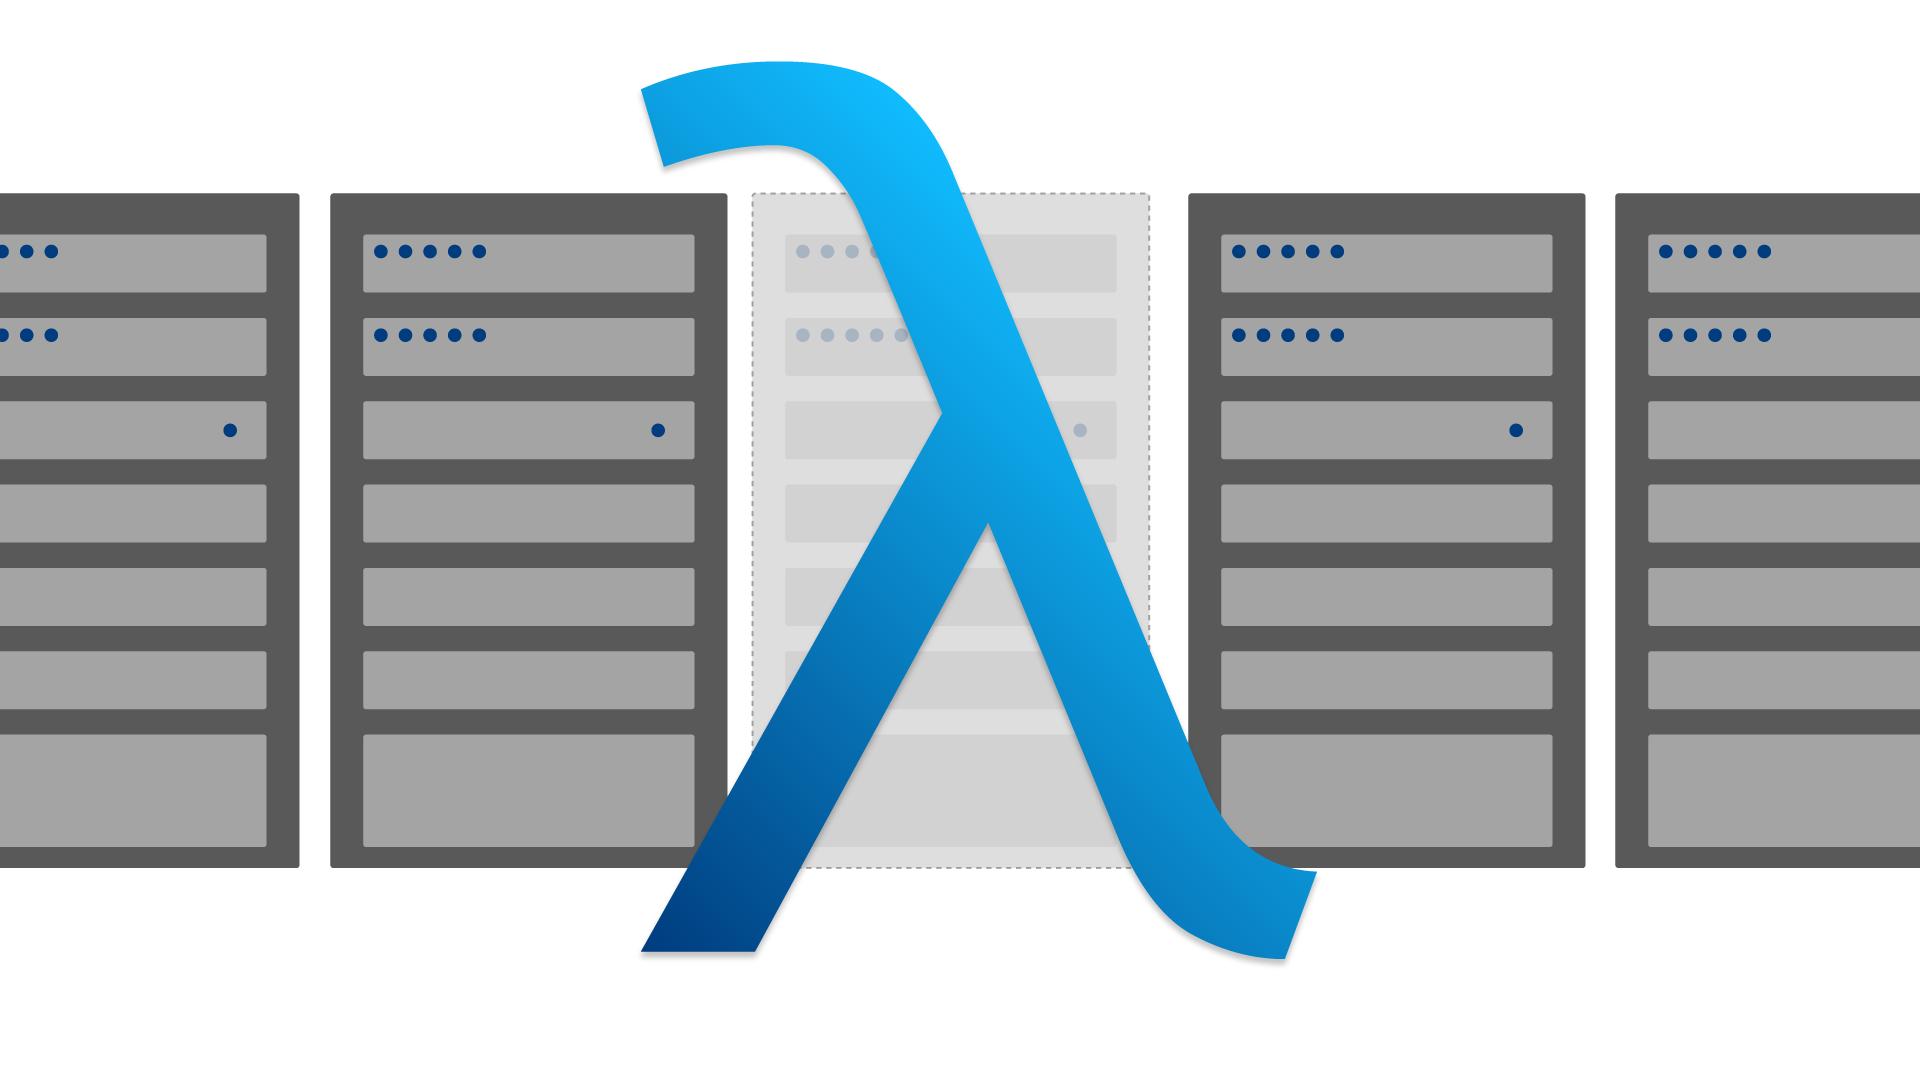 Serverless AWS Lambda – Headerbild zum Blogartikel